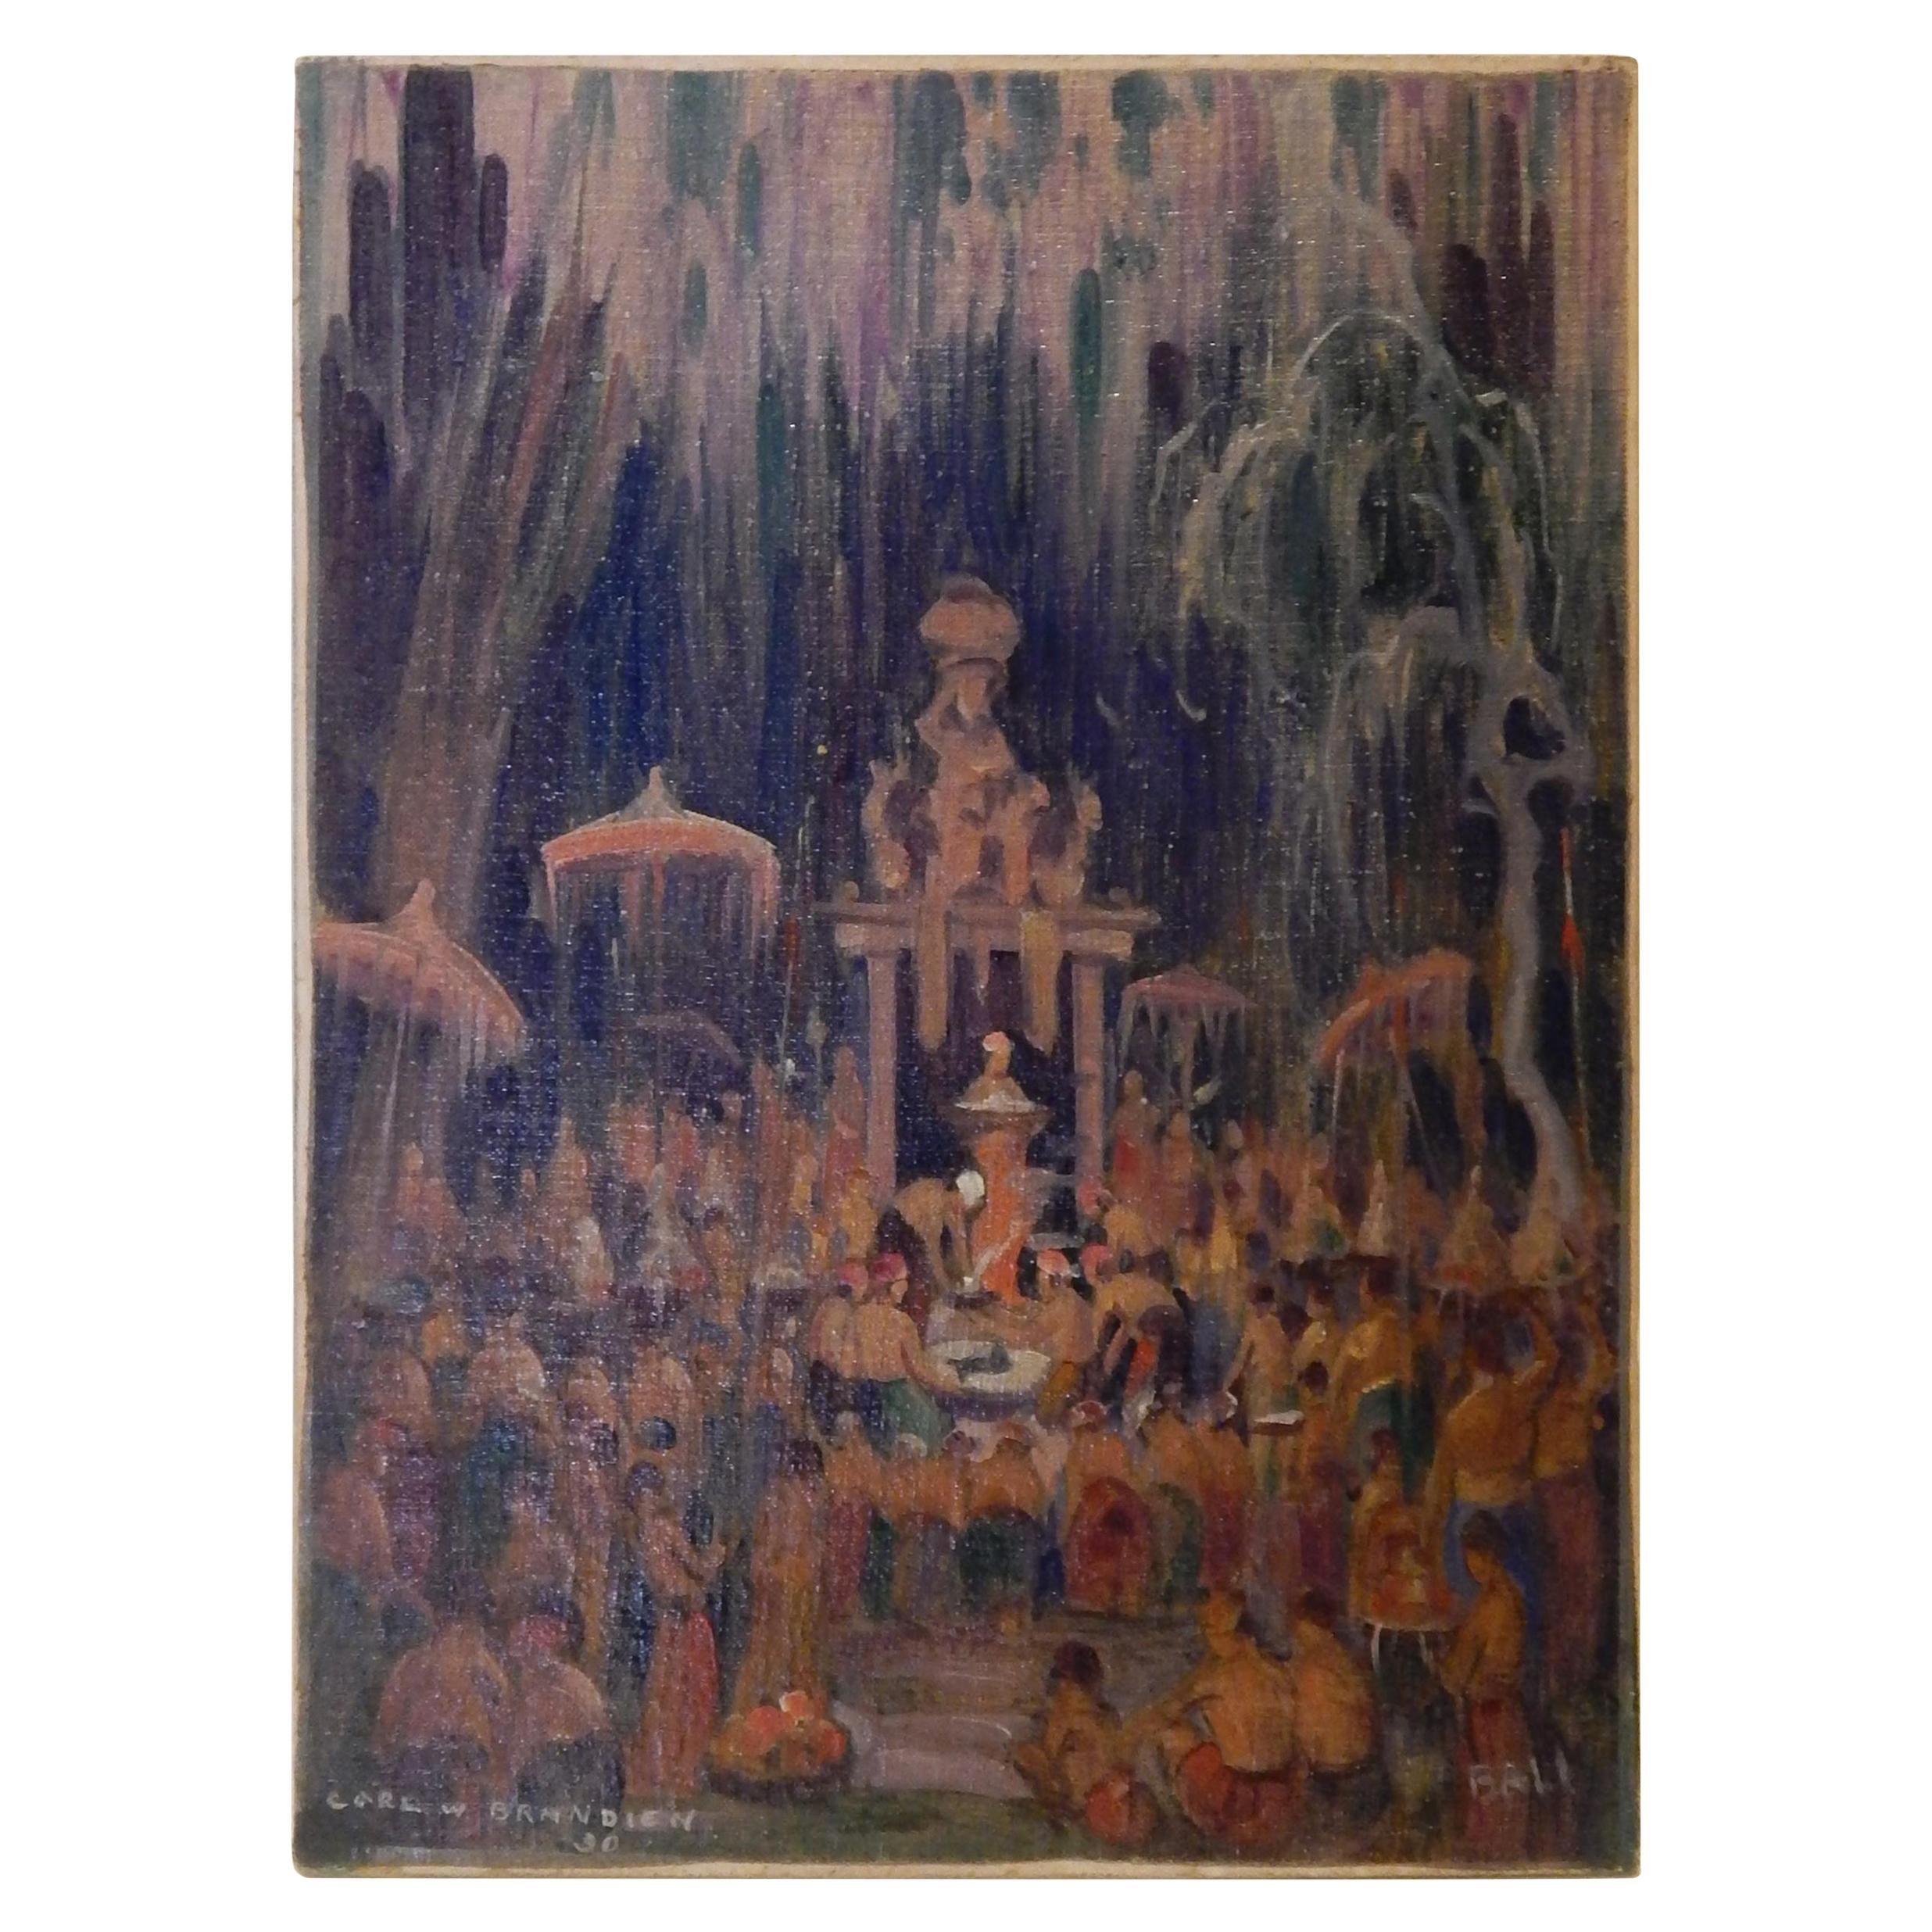 Carl Brandien New York National Academy Artist, Painting, 1930, Bali Temple